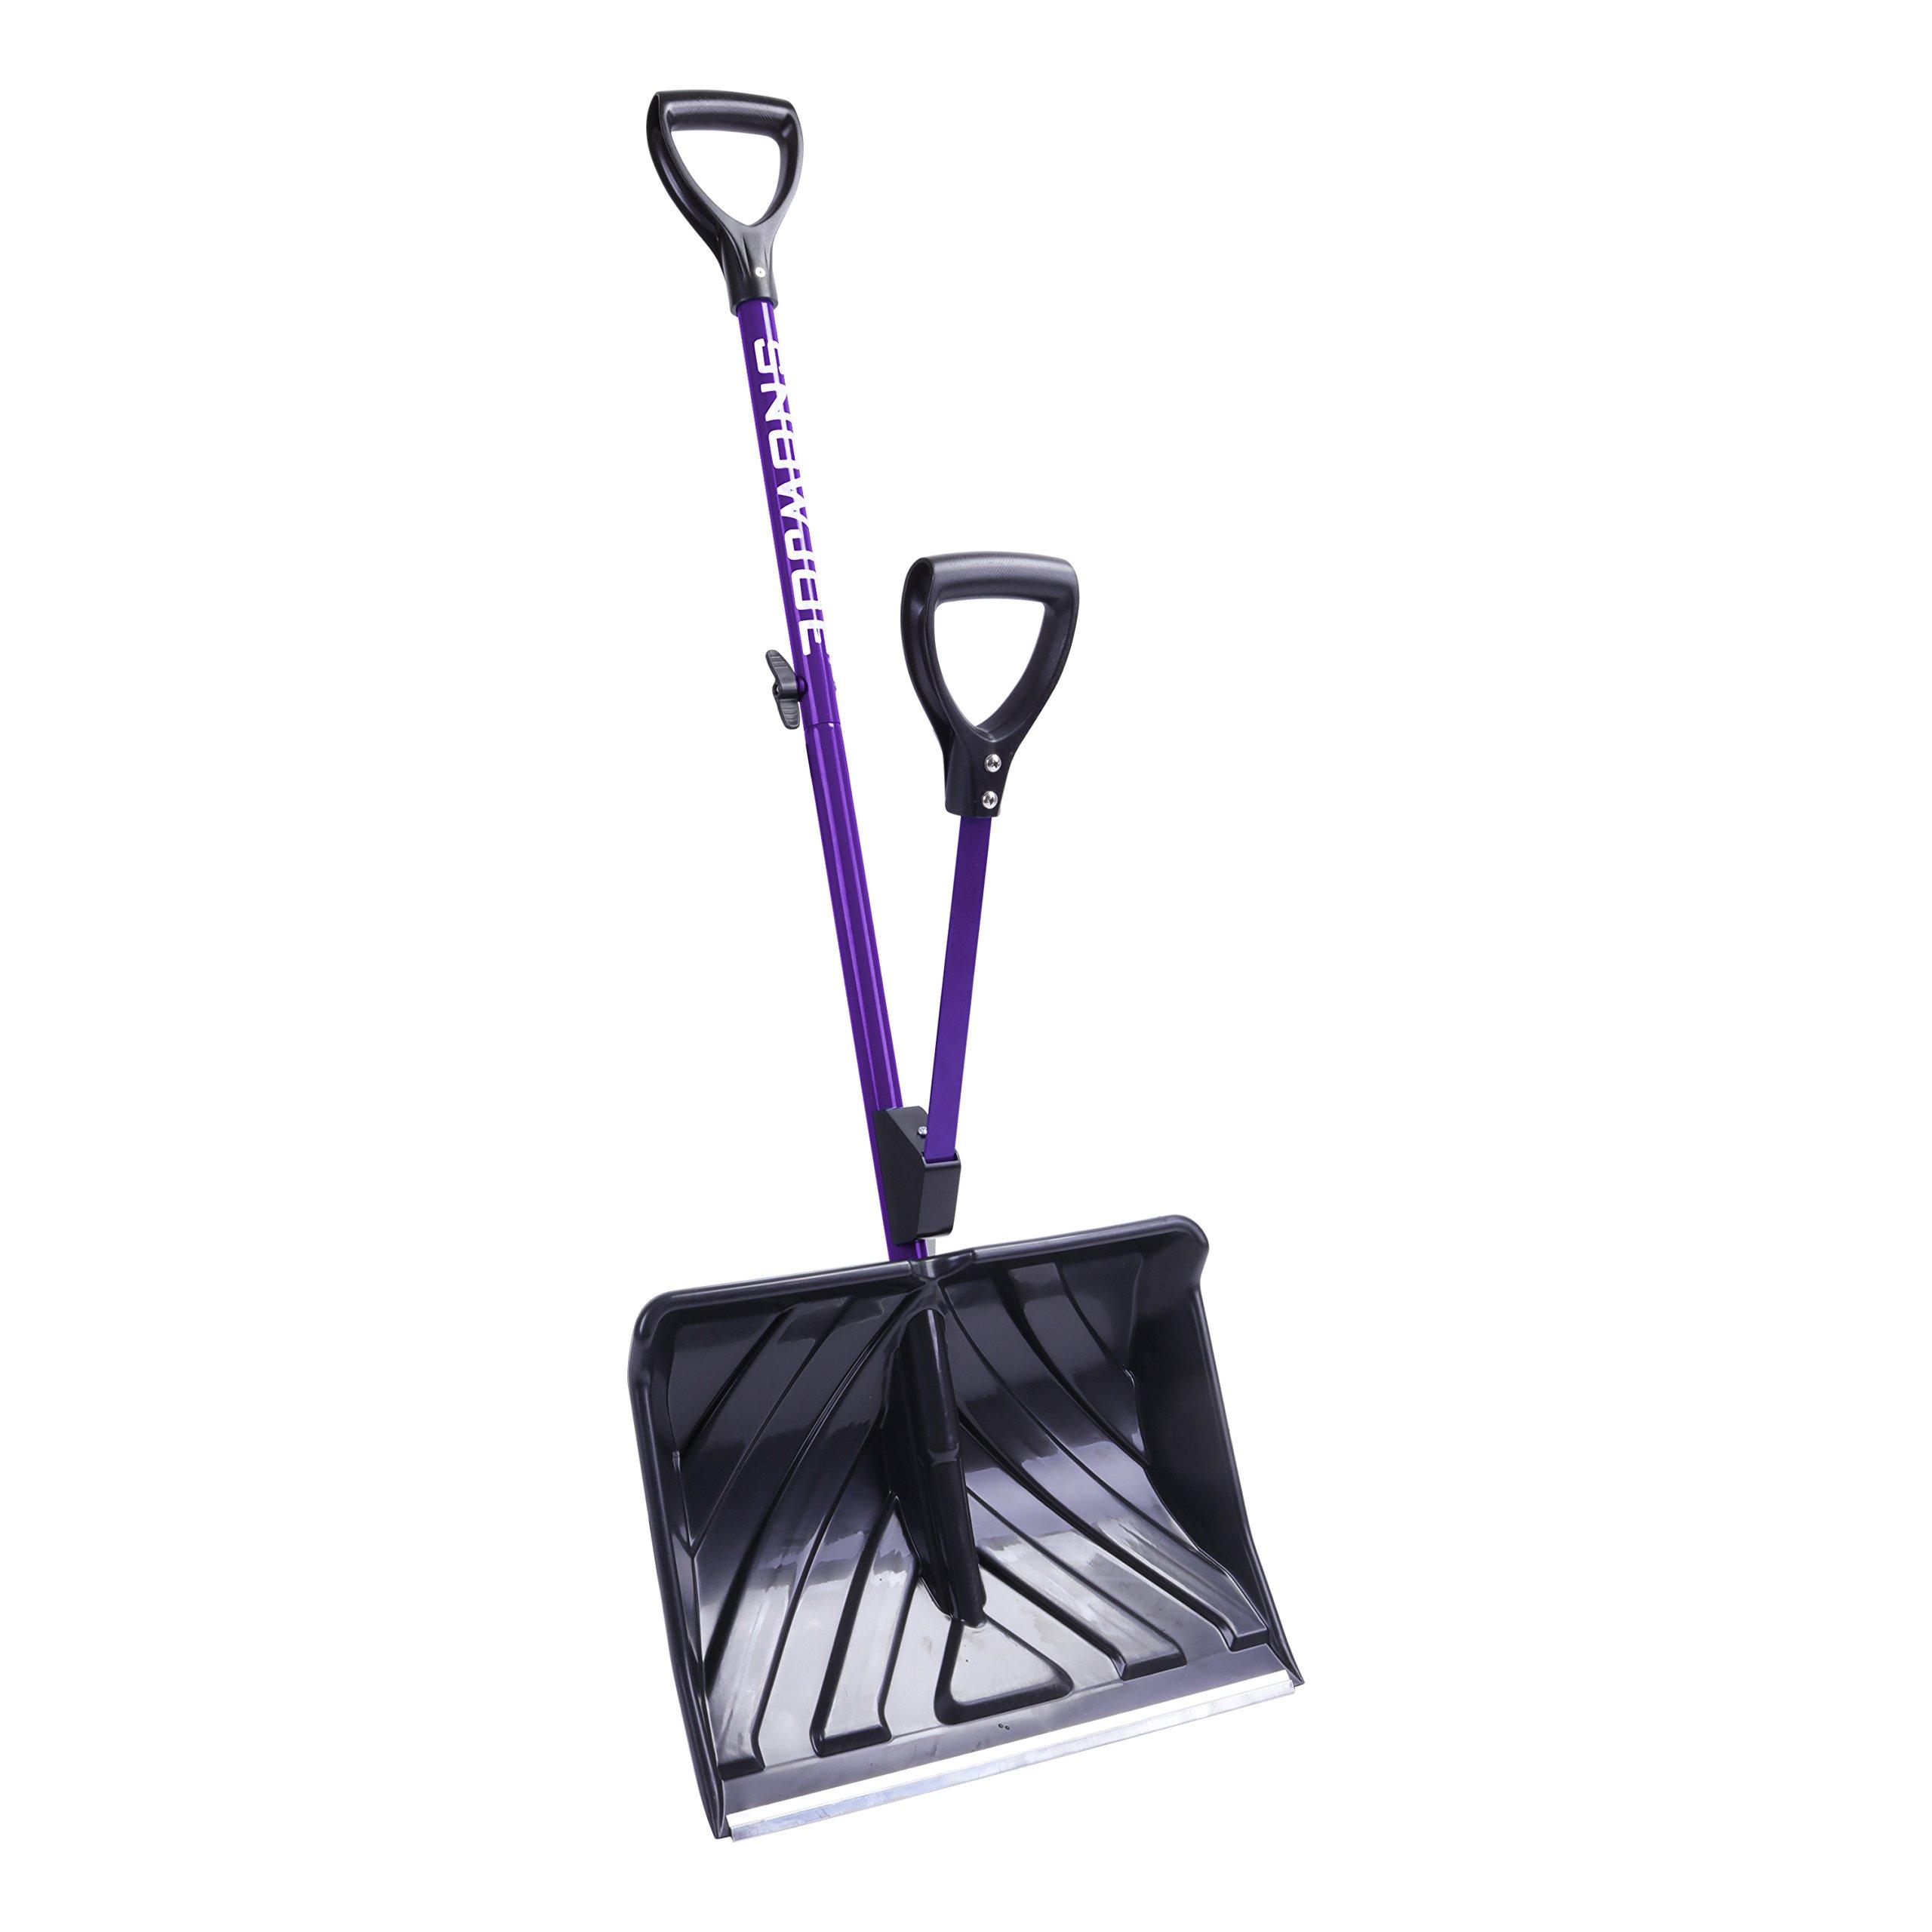 Snow Joe SJ-SHLV01-PRP-RM Shovelution Strain-Reducing Snow Shovel (Purple) (Certified Refurbished) | 18-Inch | Spring Assisted Handle